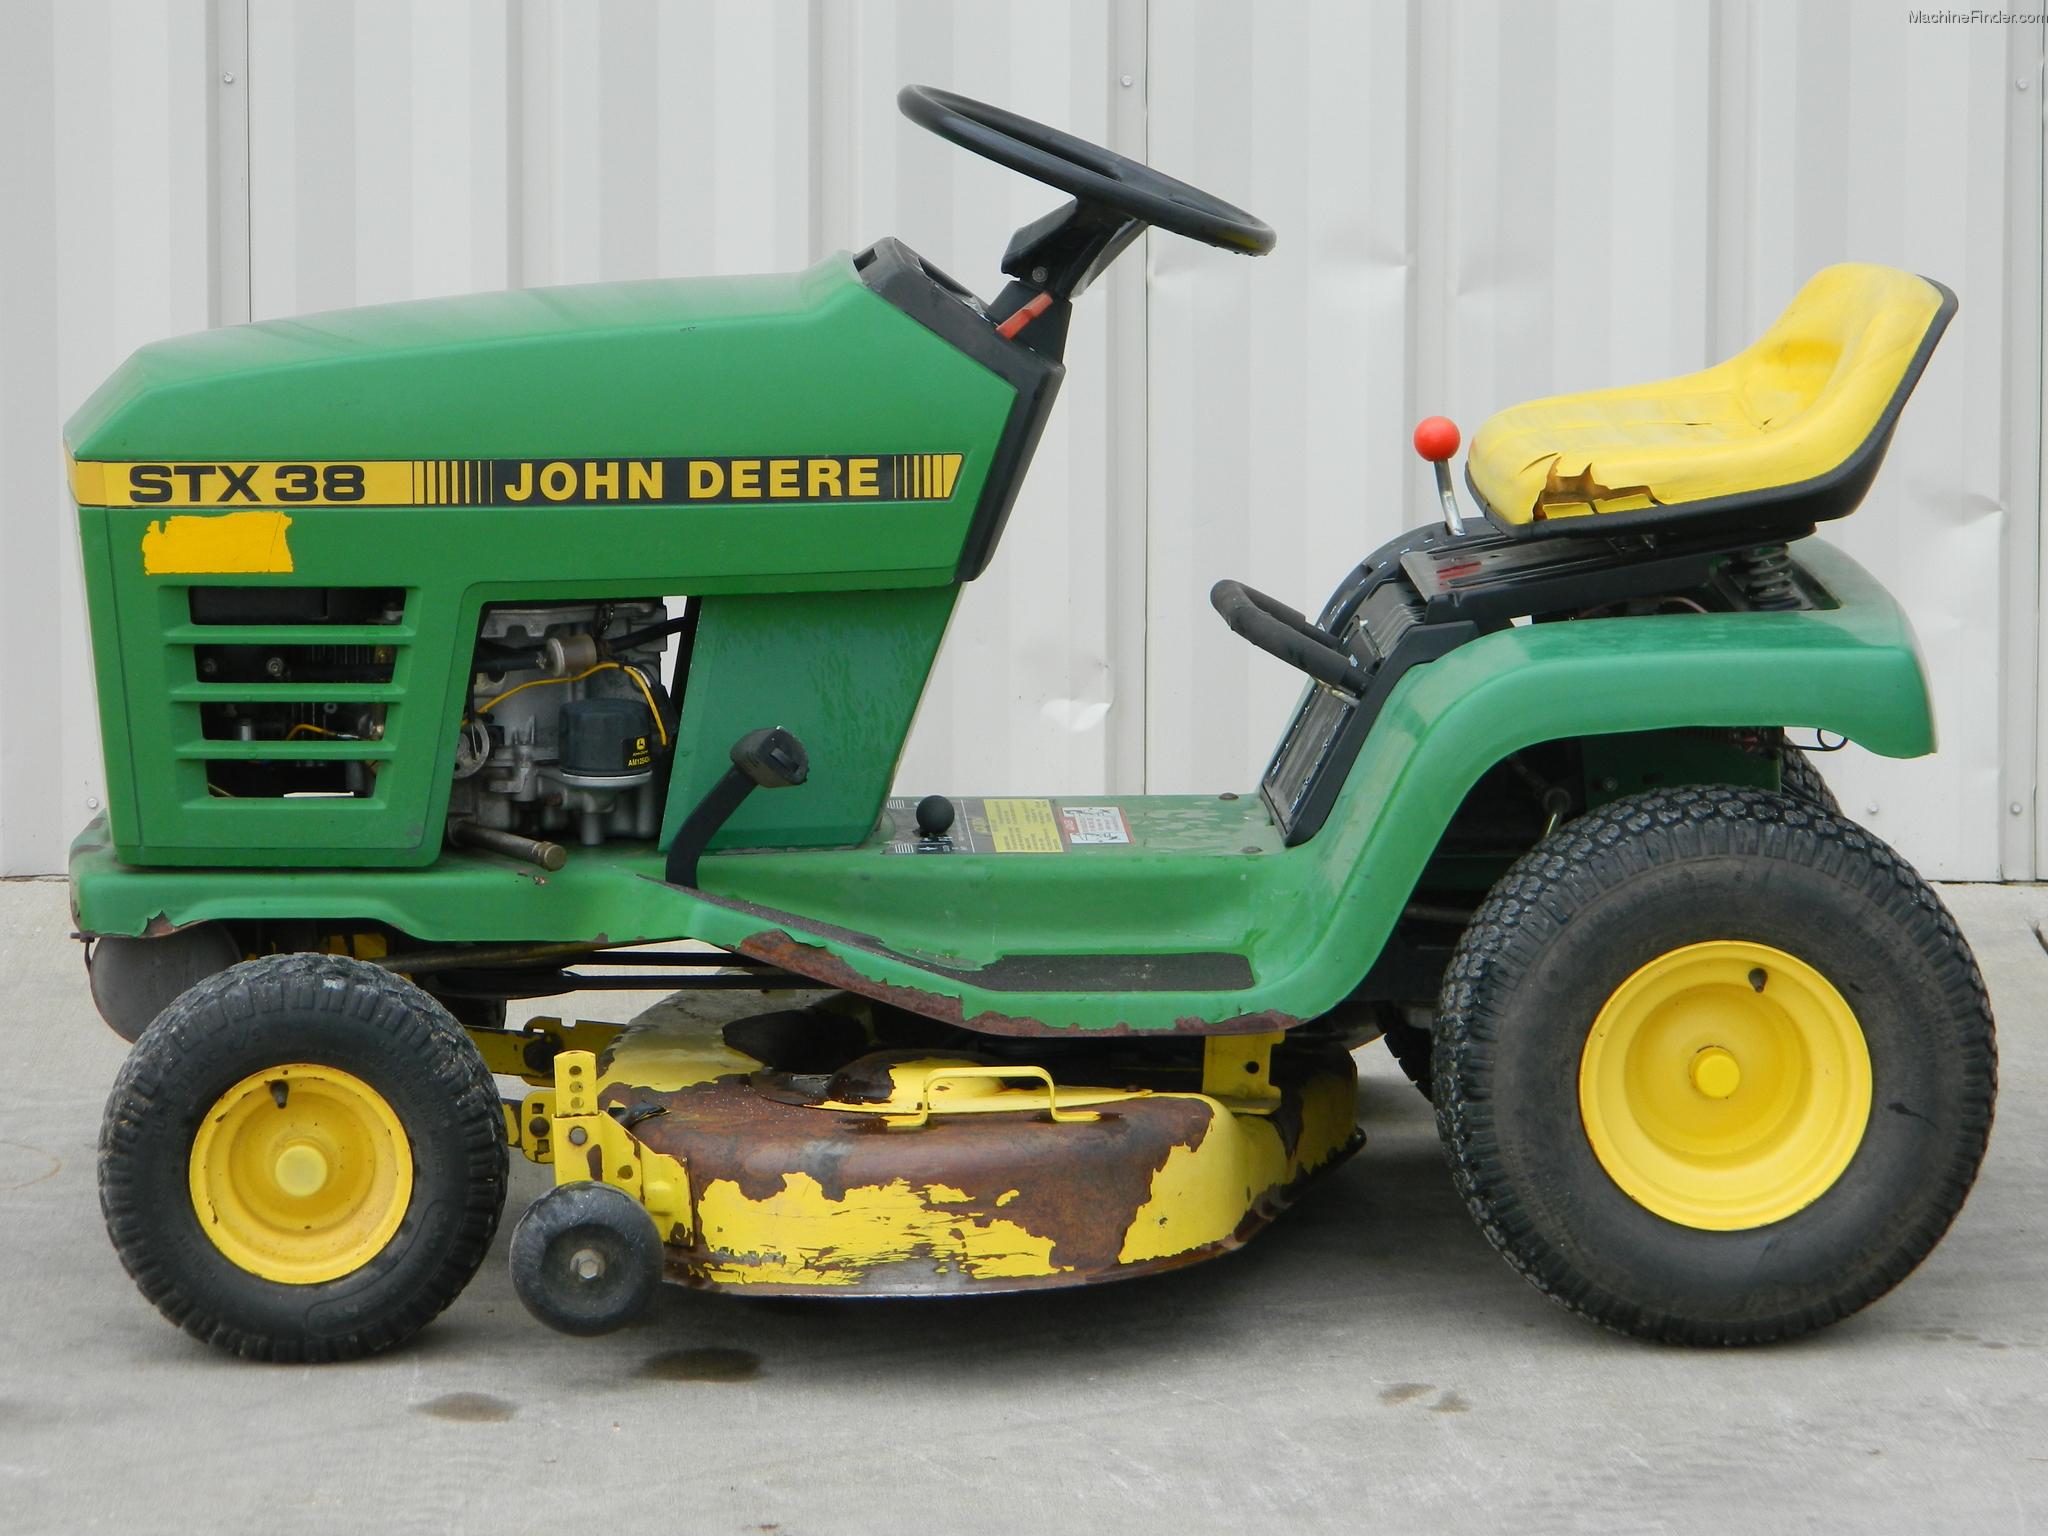 John Deere Stx 38 : Pin john deere stx lawn on pinterest